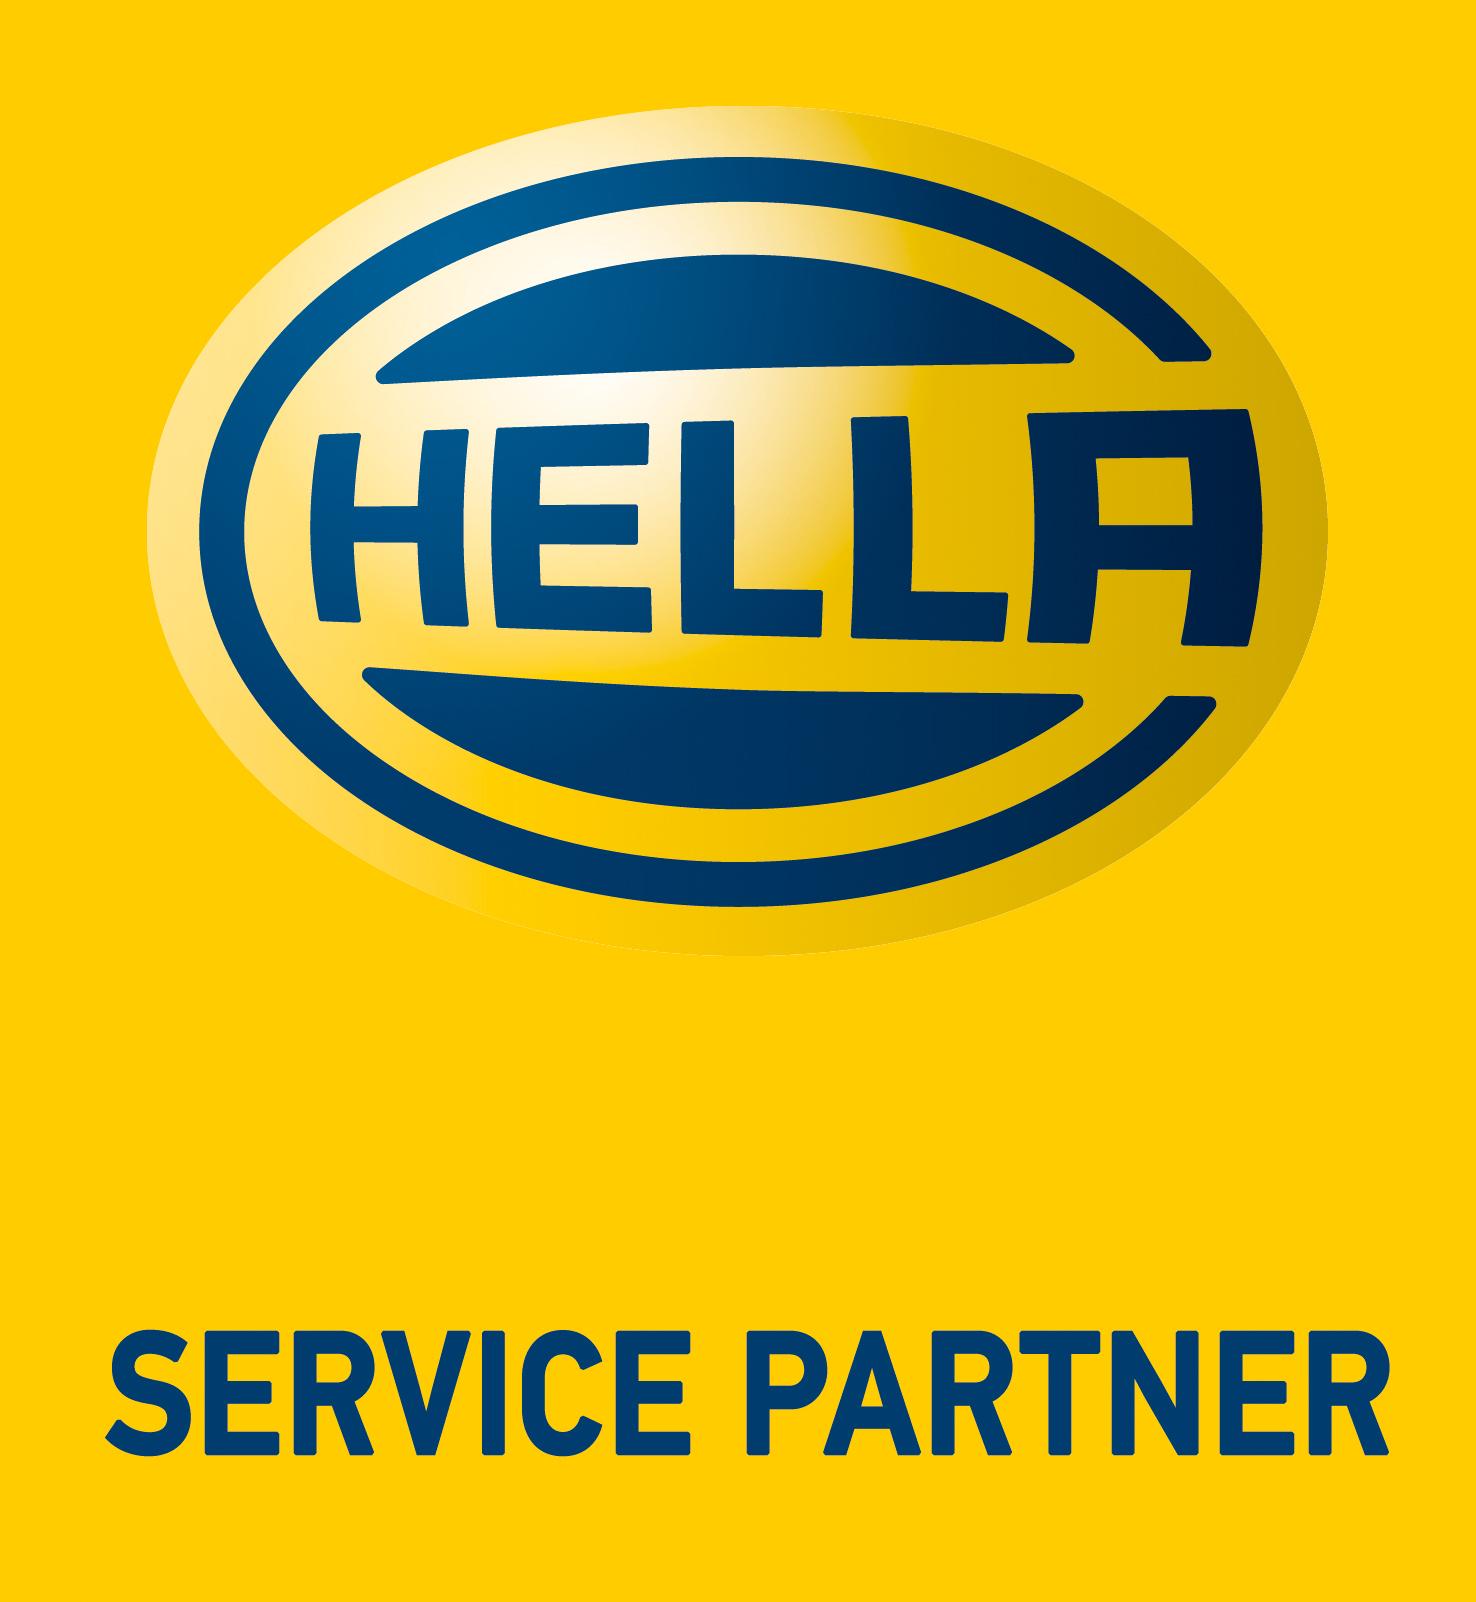 KJ Auto Auning - Hella Service Partner logo